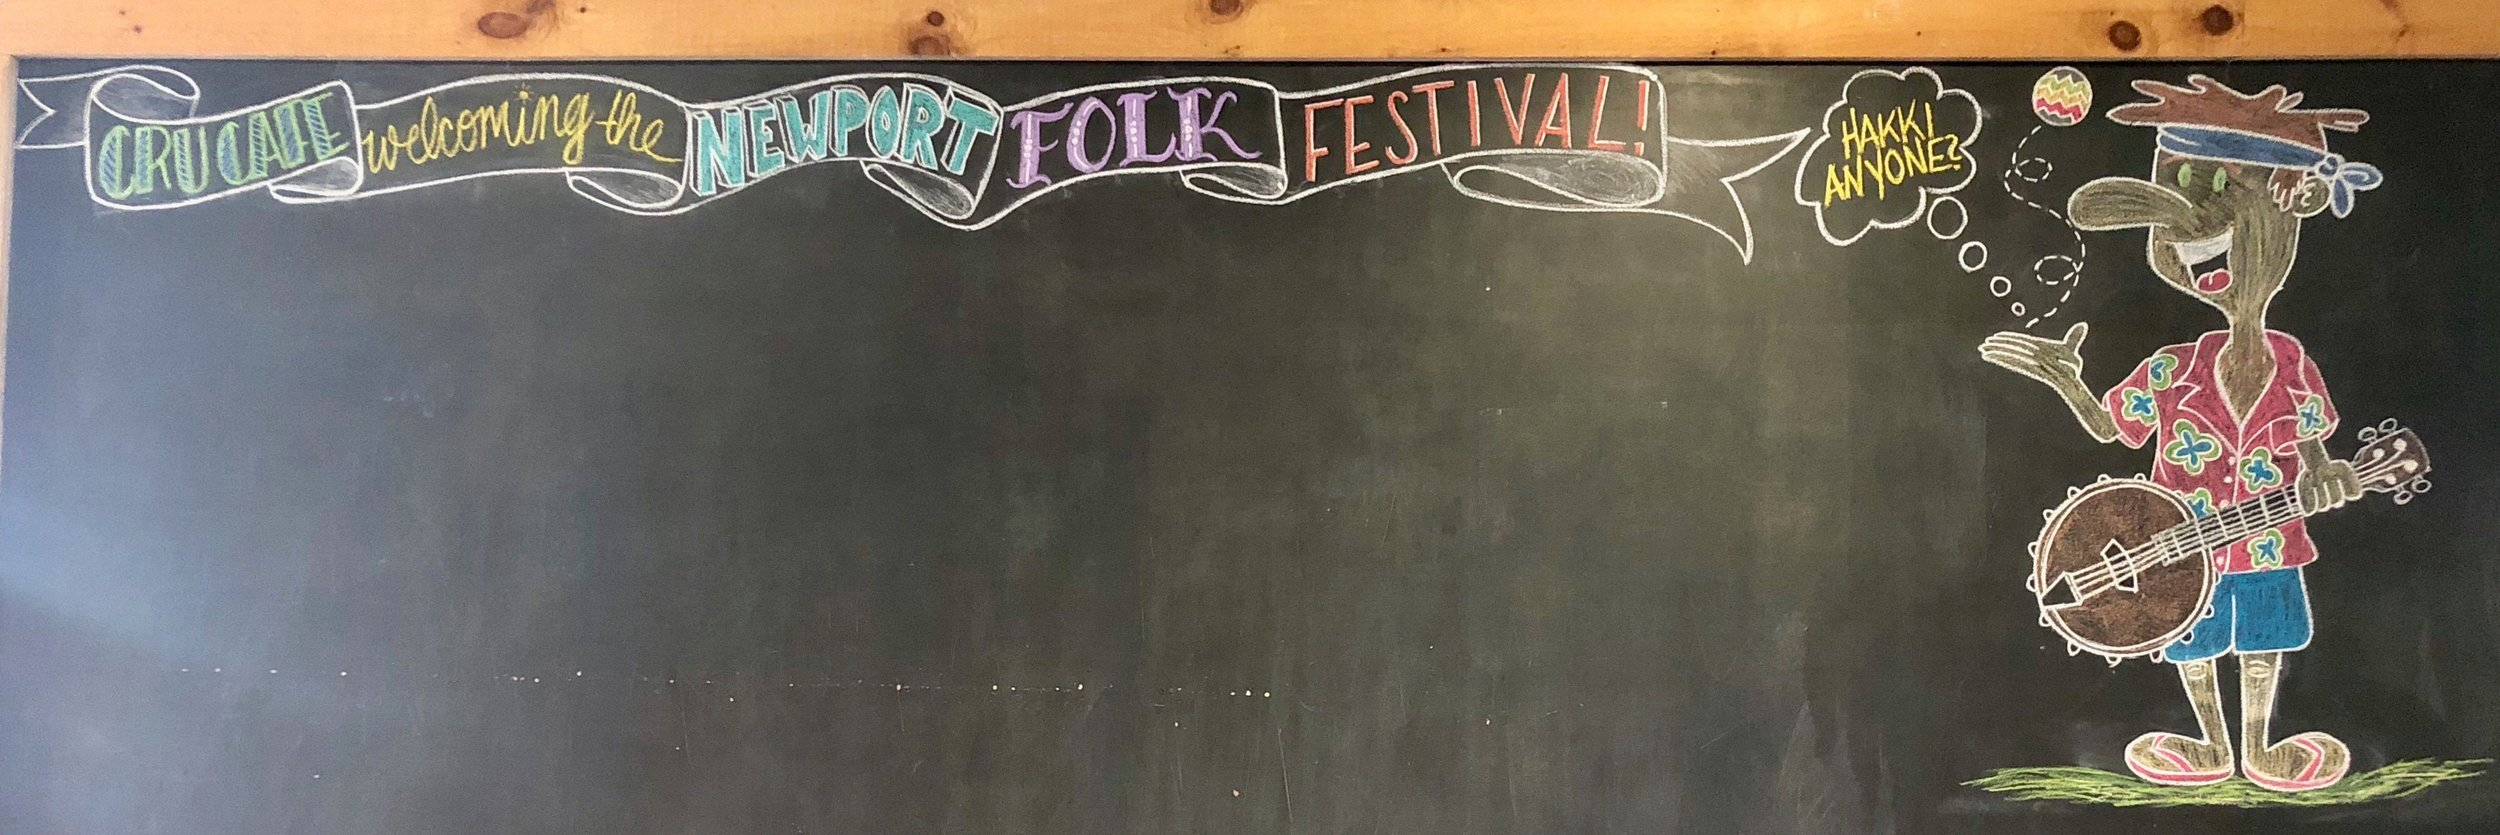 Ready for Folk Fest weekend!